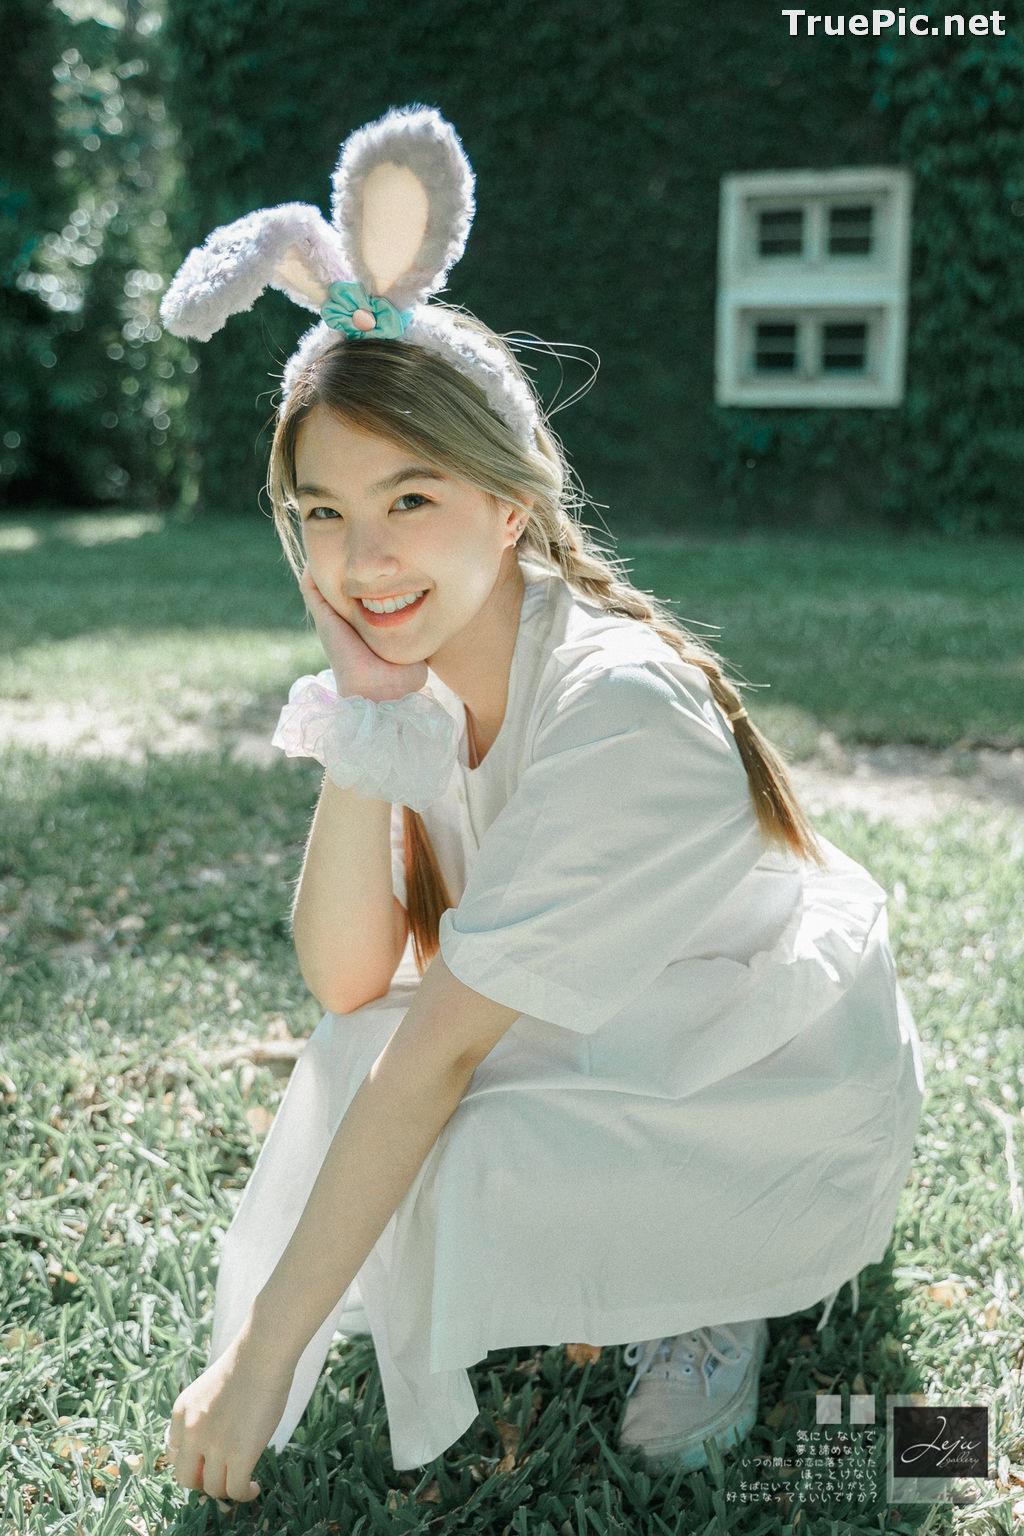 Image Thailand Cute Model - Napat Cdhg - Gam Bunny Girl - TruePic.net - Picture-6